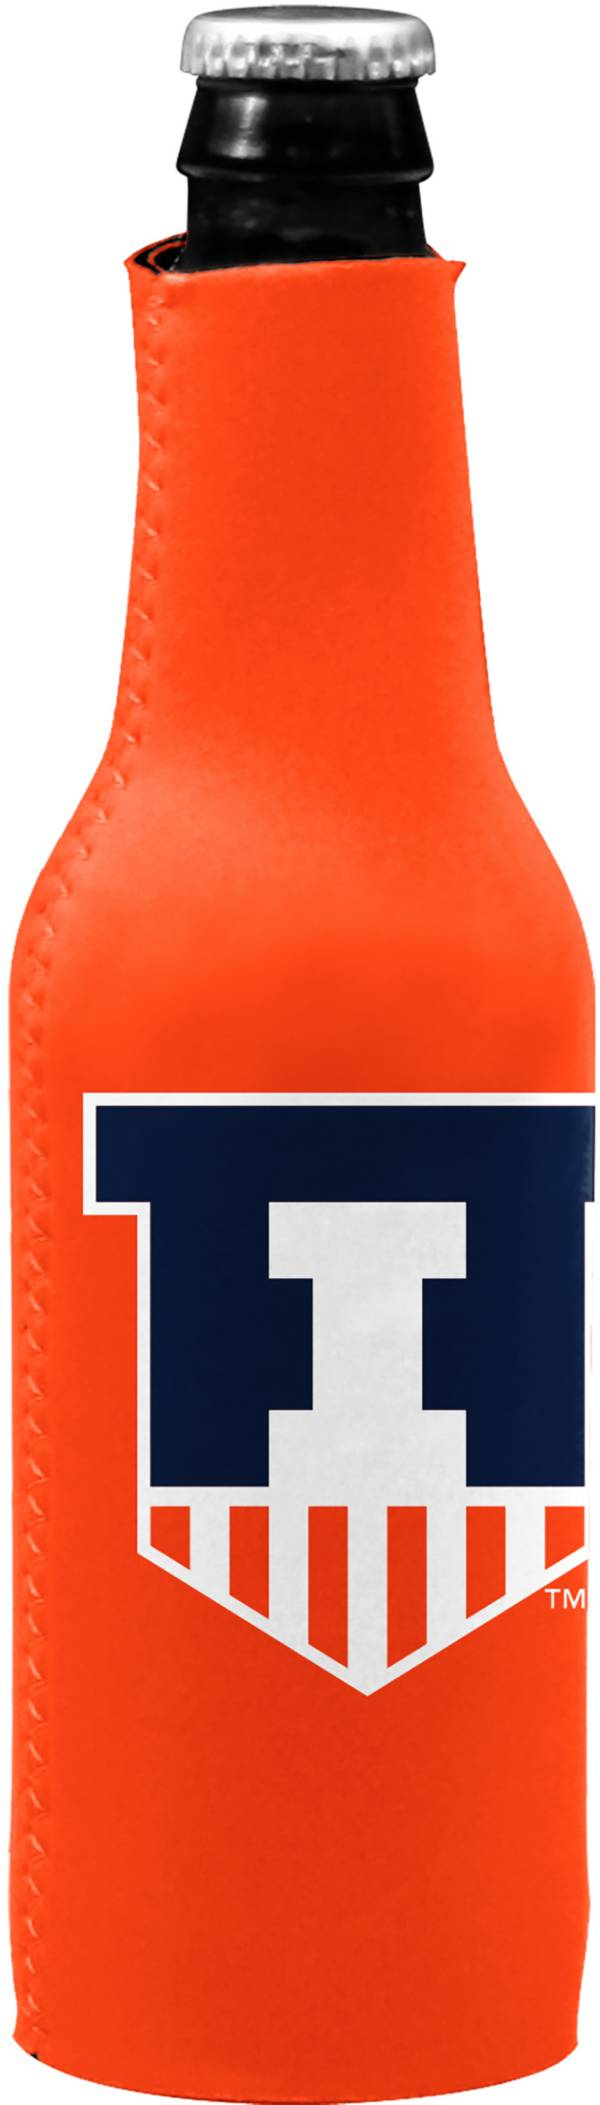 Illinois Fighting Illini Bottle Koozie product image